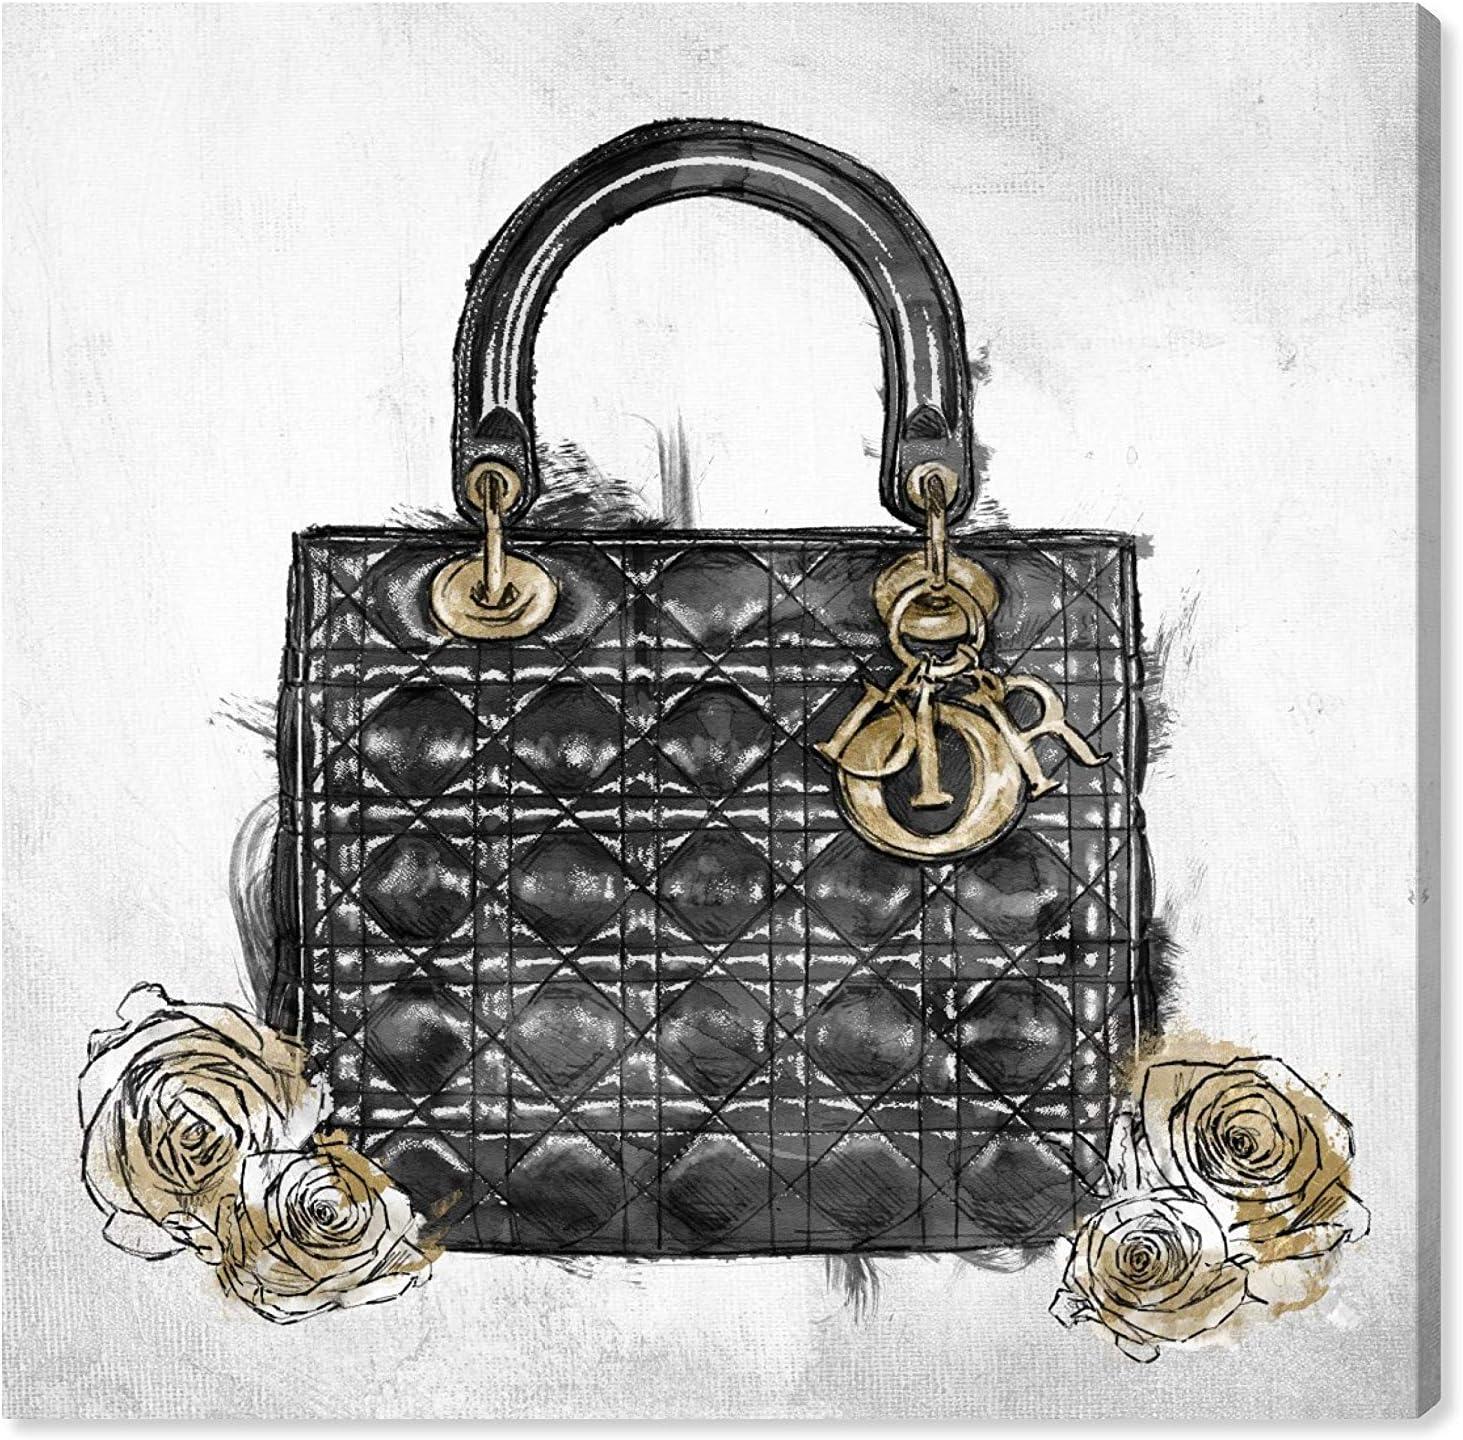 Oliver Gal 'Christian Essentials Black II' The Fashion Wall Art Decor Collection Contemporary Premium Canvas Art Print